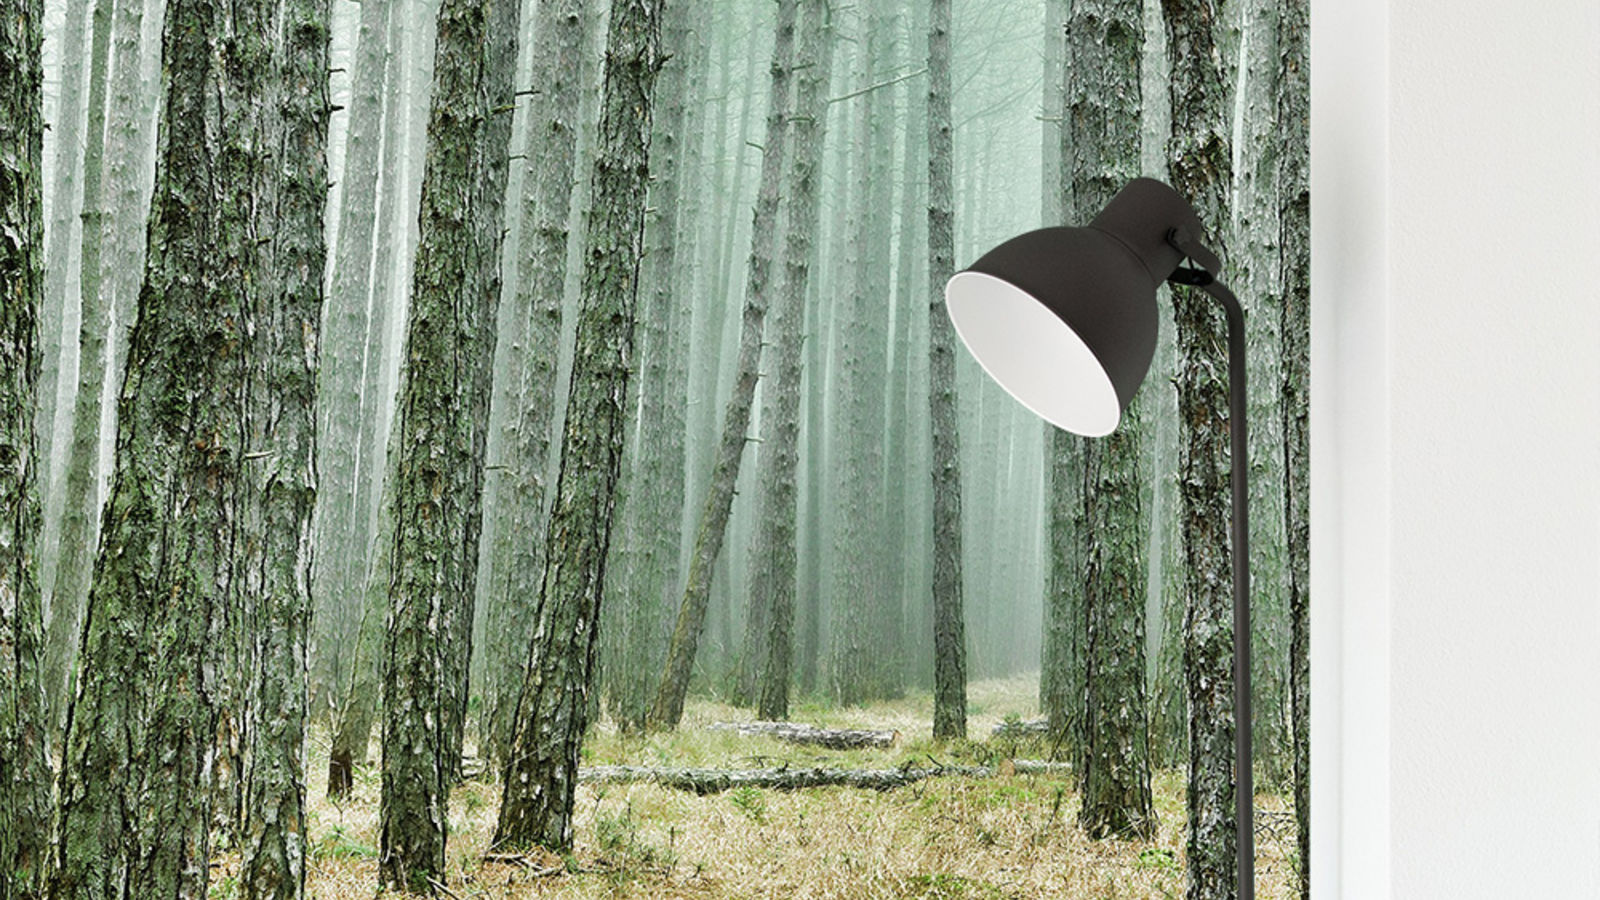 Fototapete Wald im XXL-Format selbst gestalten